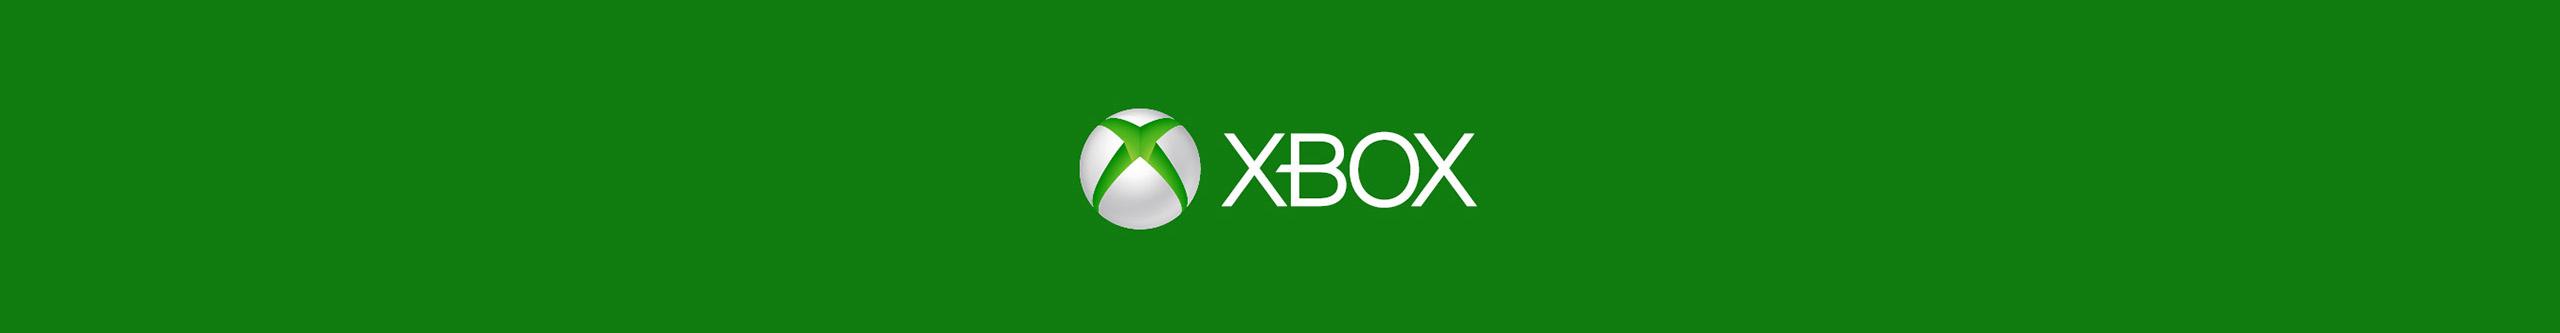 Xbox-tuotteet